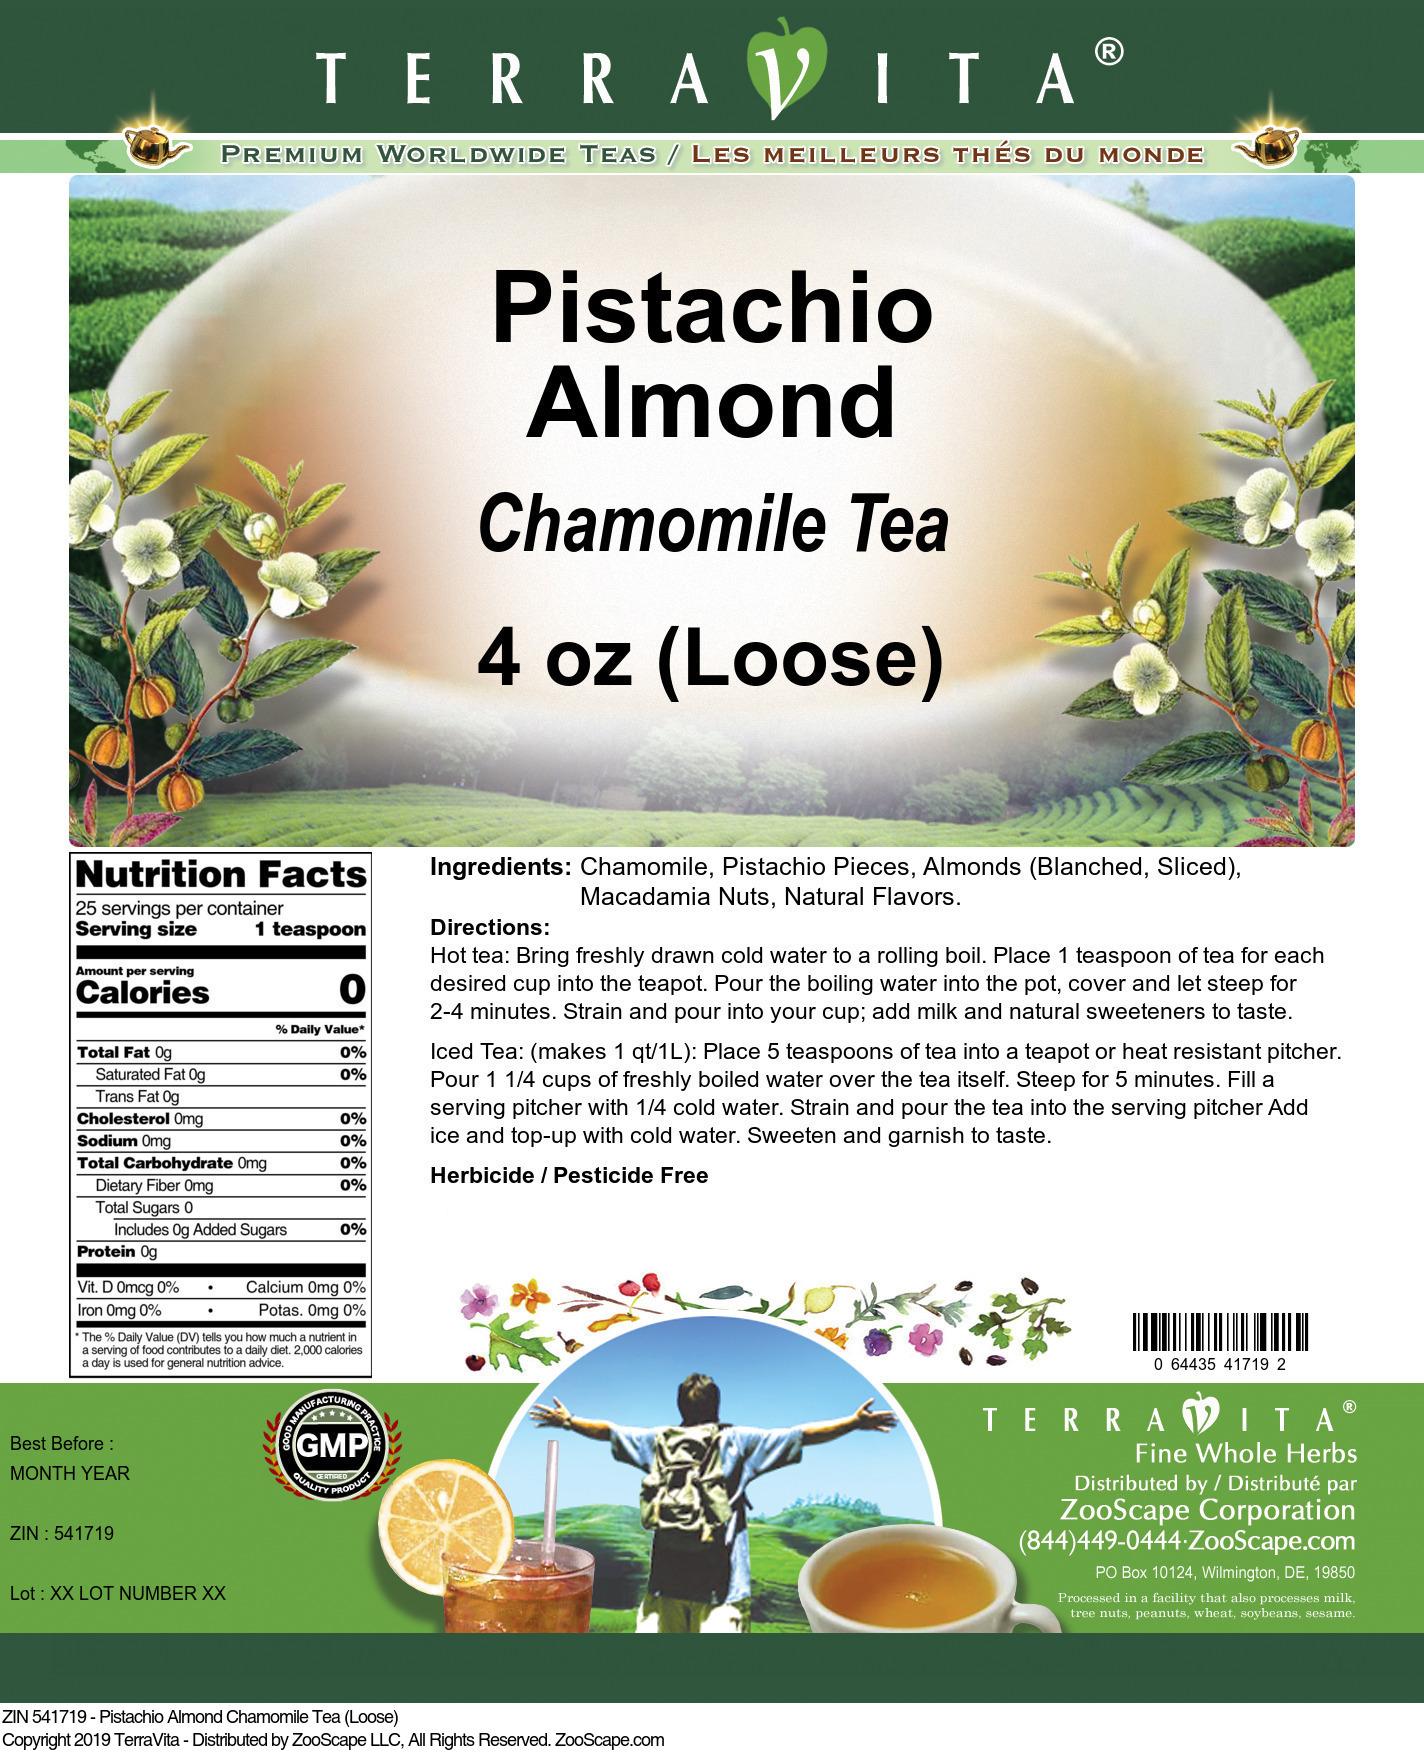 Pistachio Almond Chamomile Tea